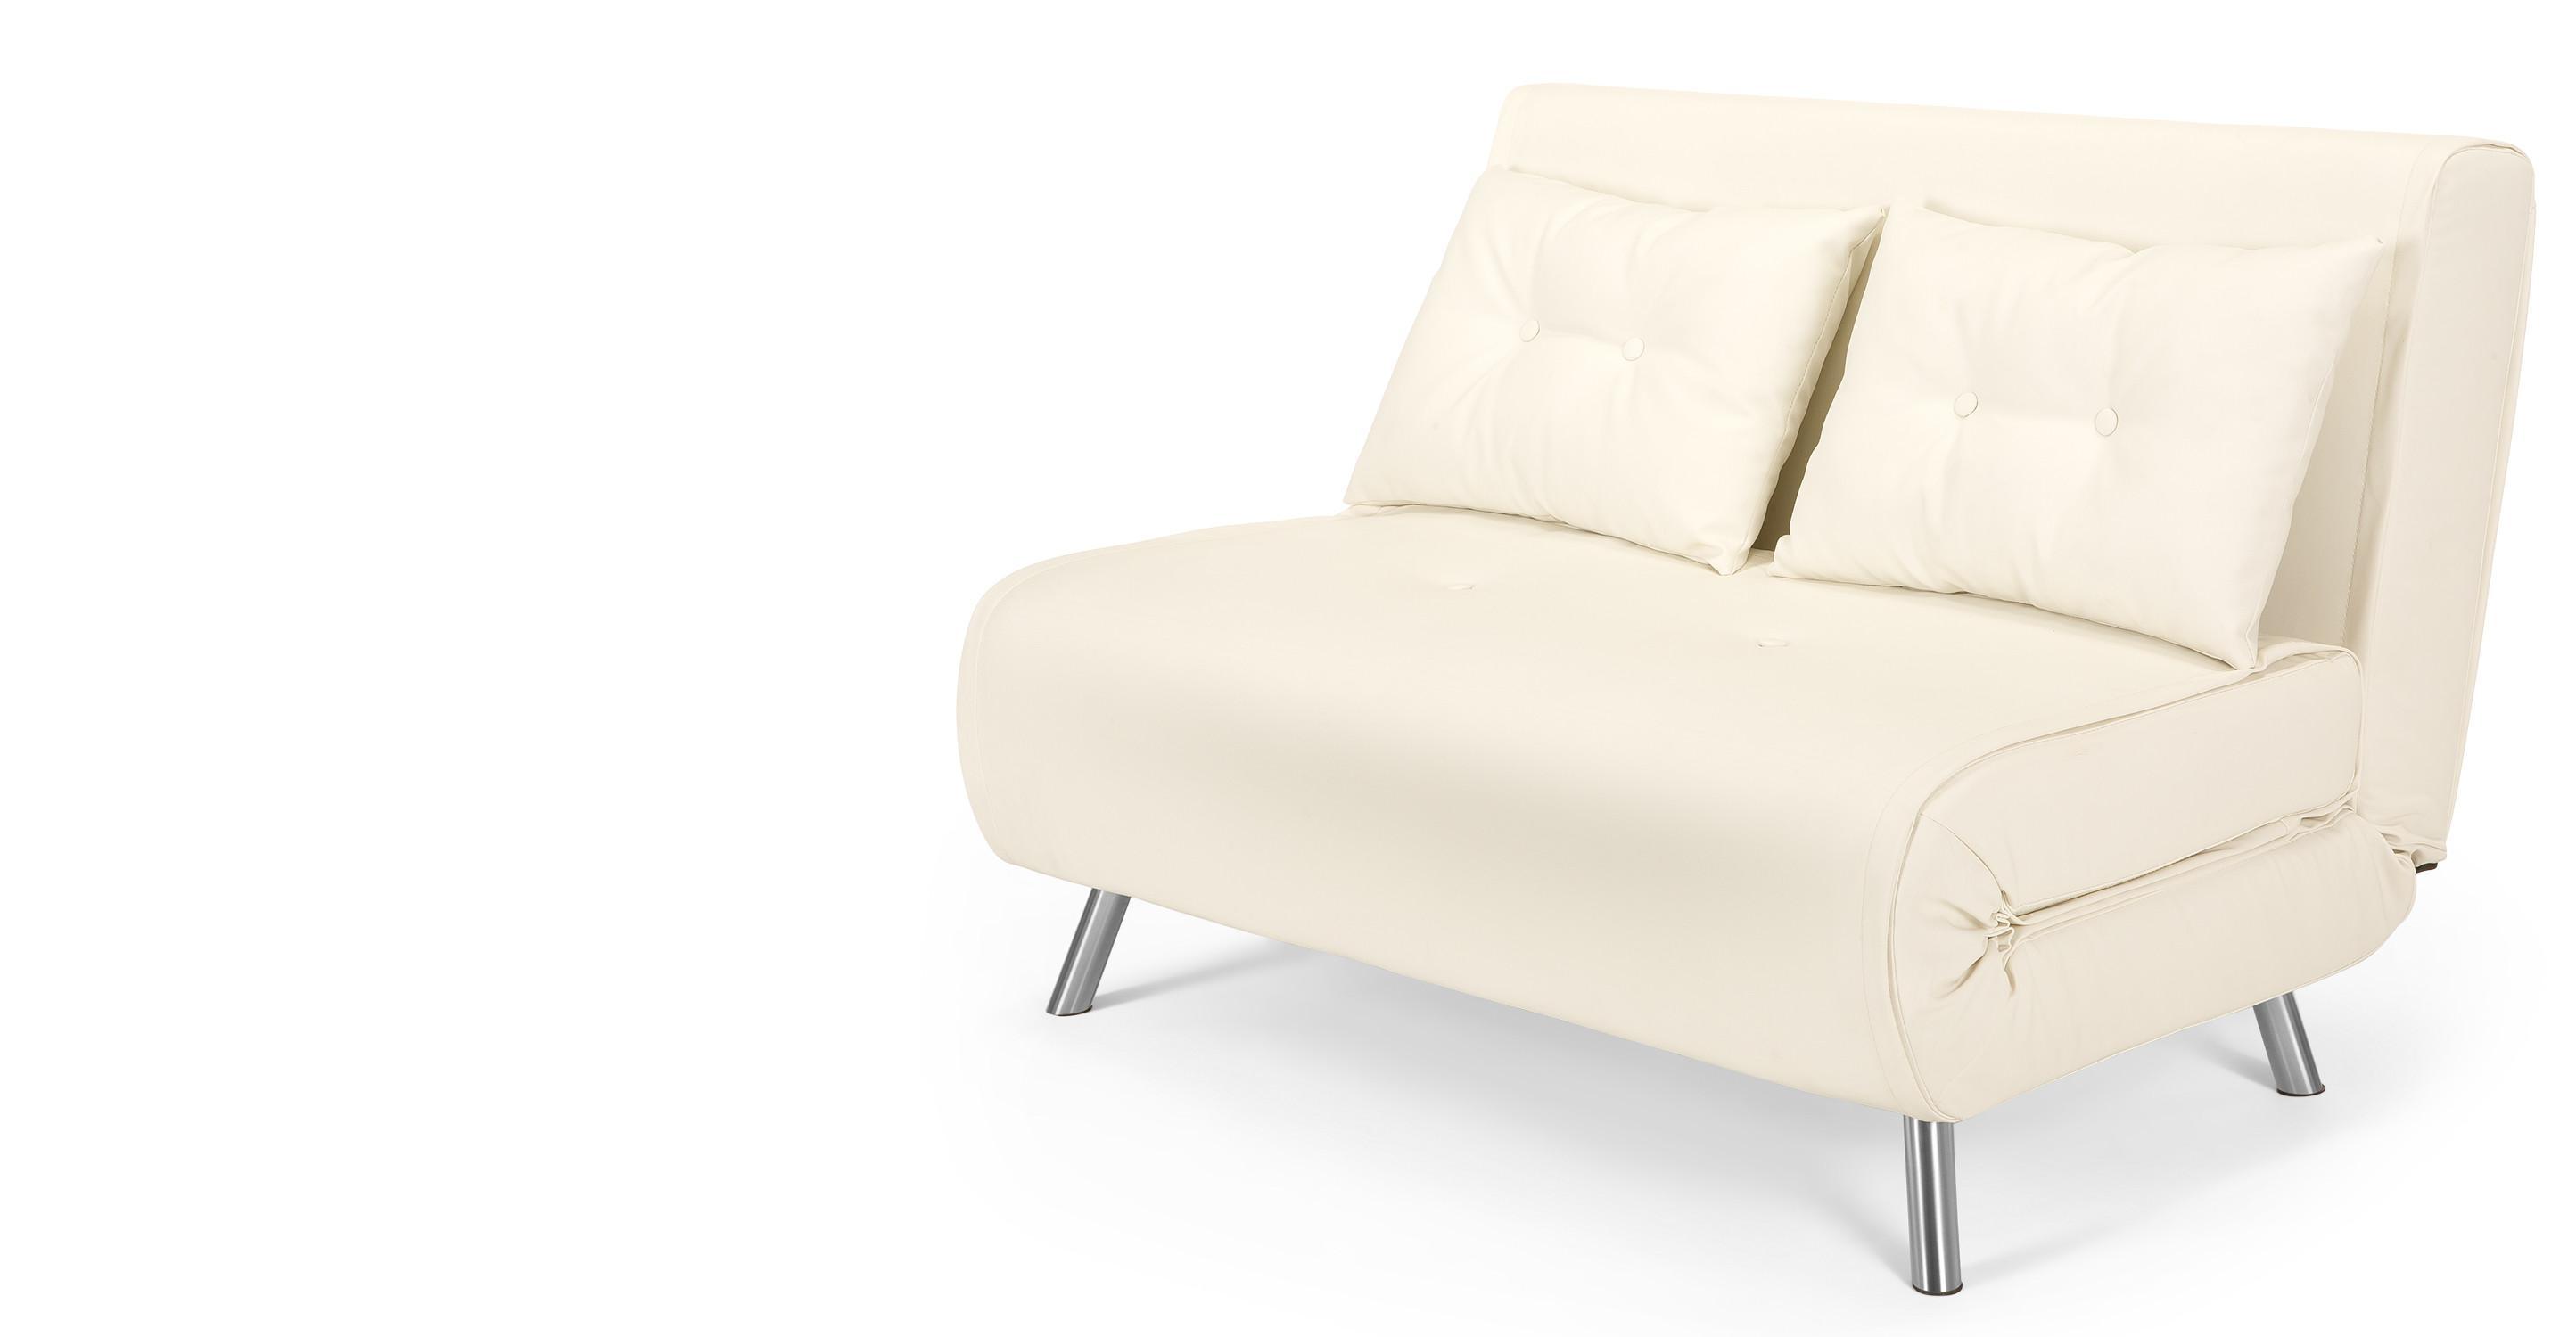 Sofa: Tiny Sofas Pertaining To Tiny Sofas (Image 11 of 20)